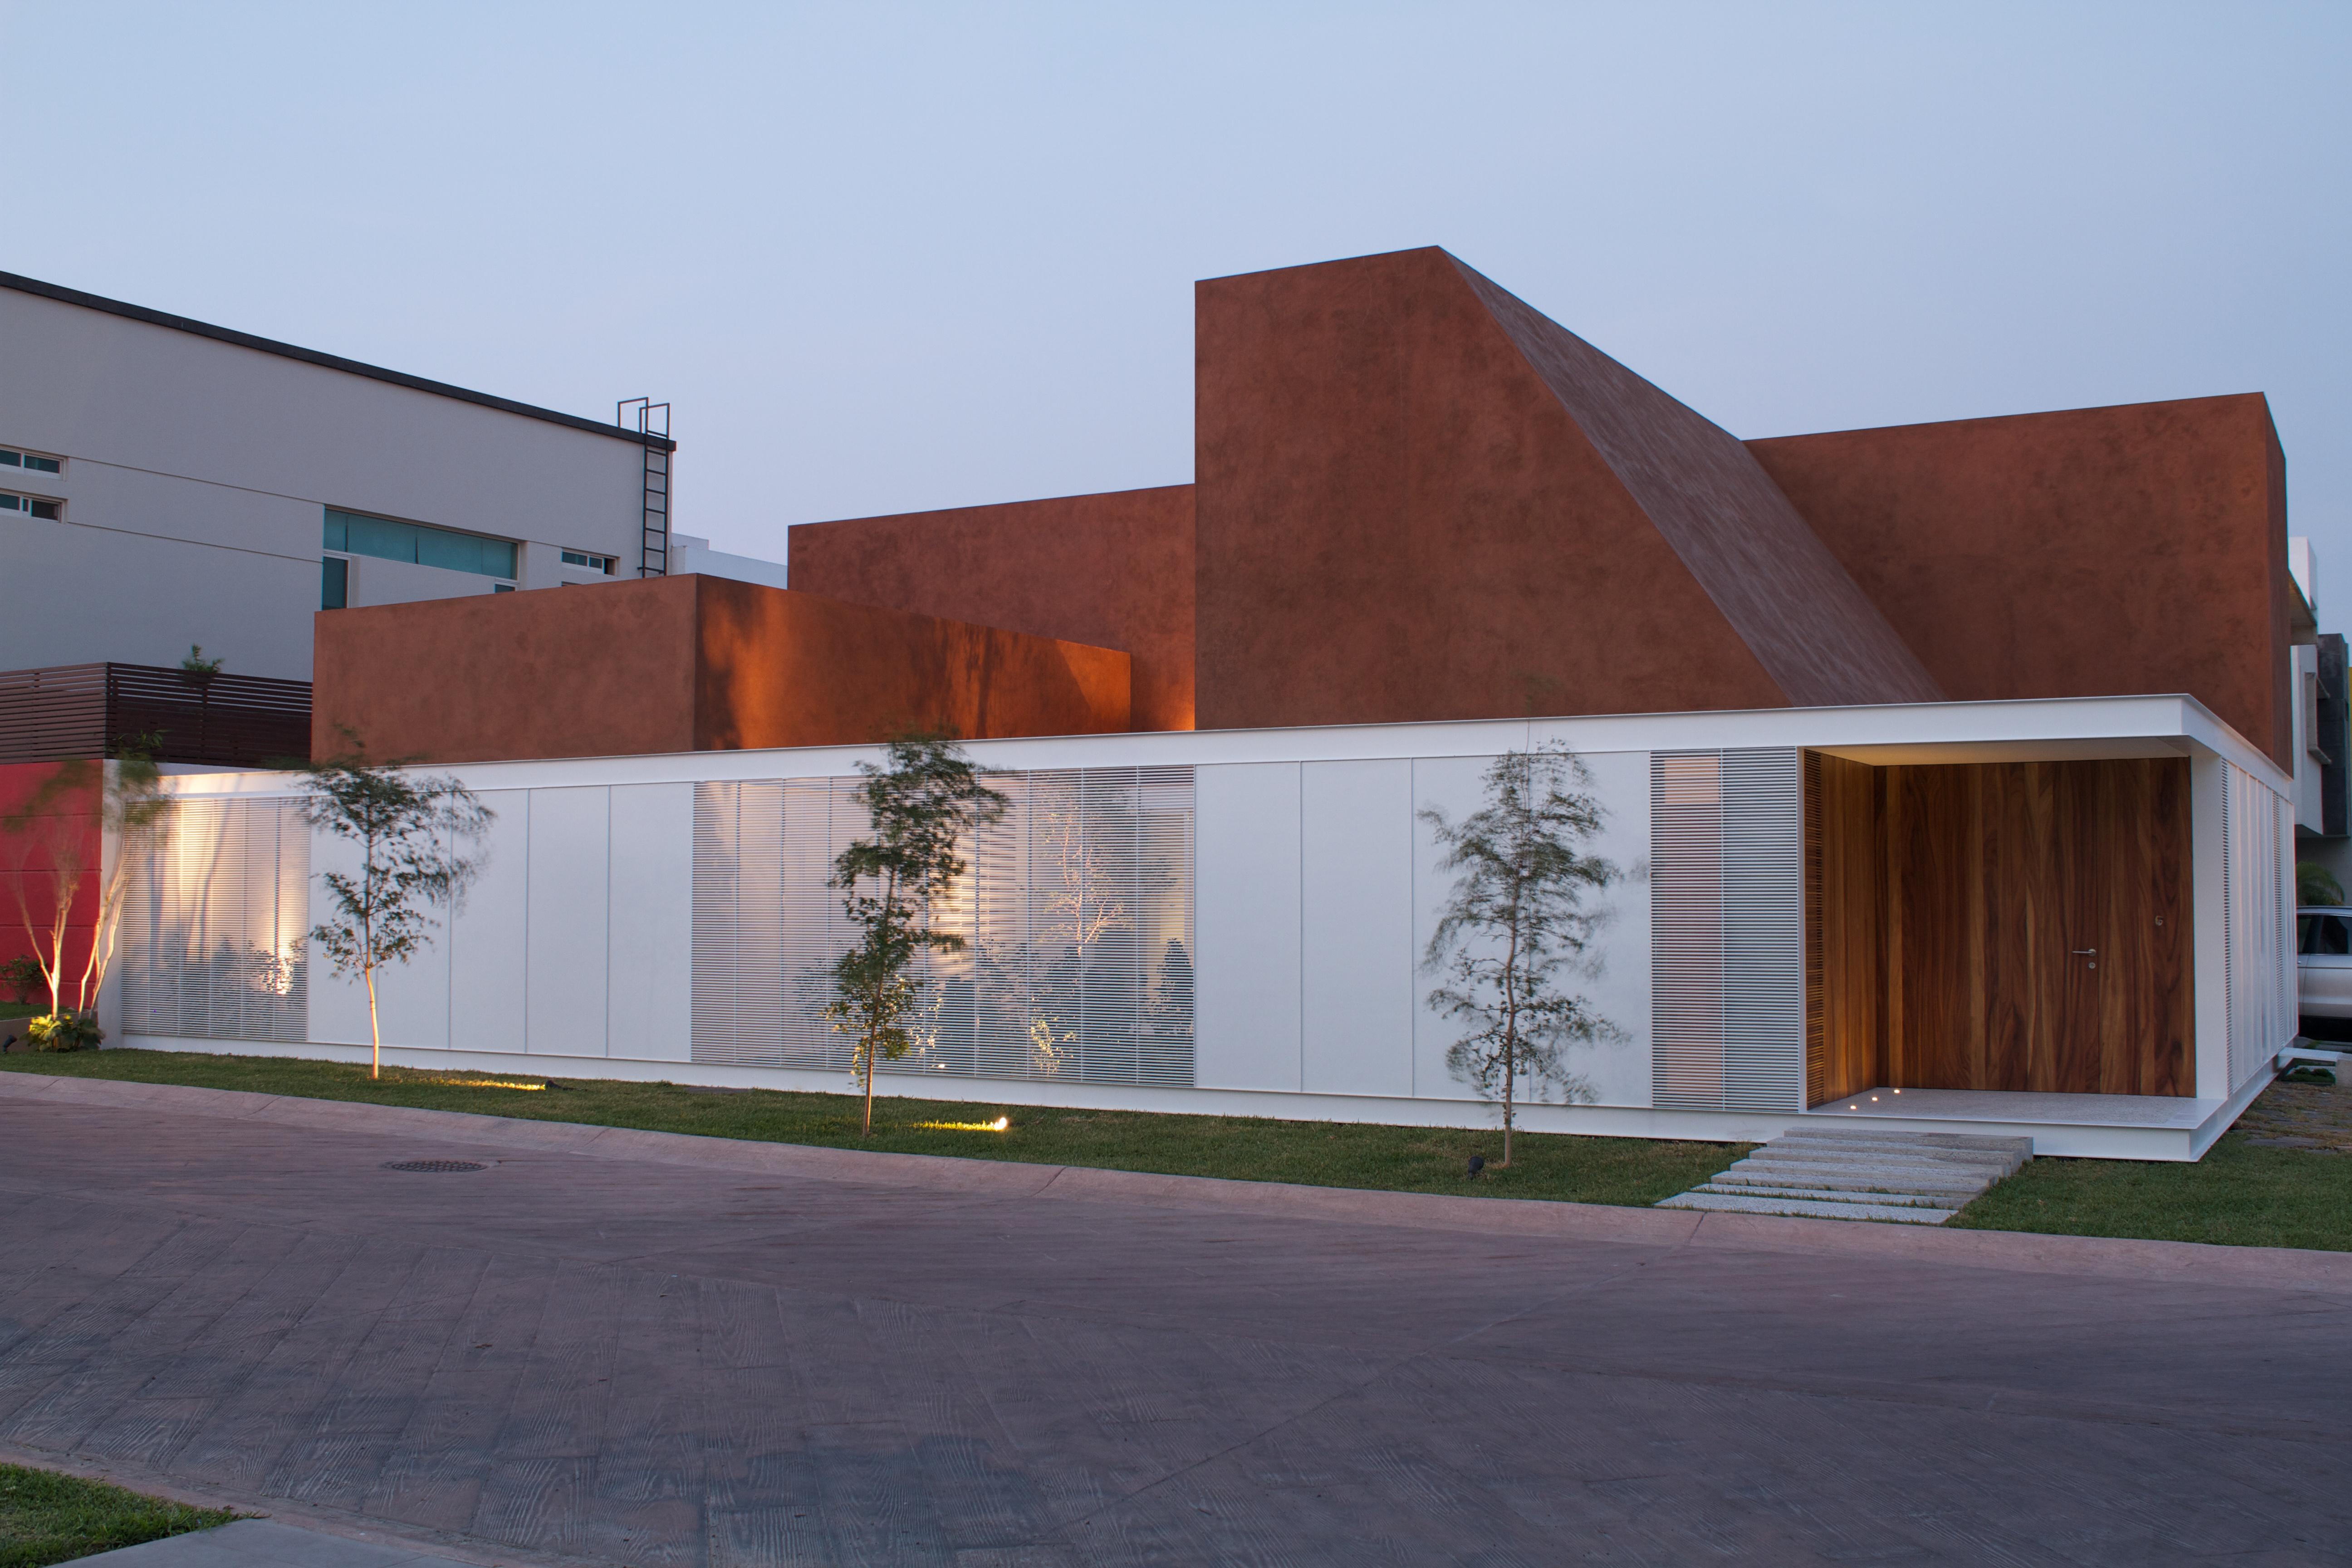 Casa Arenas / AD11, © AD11